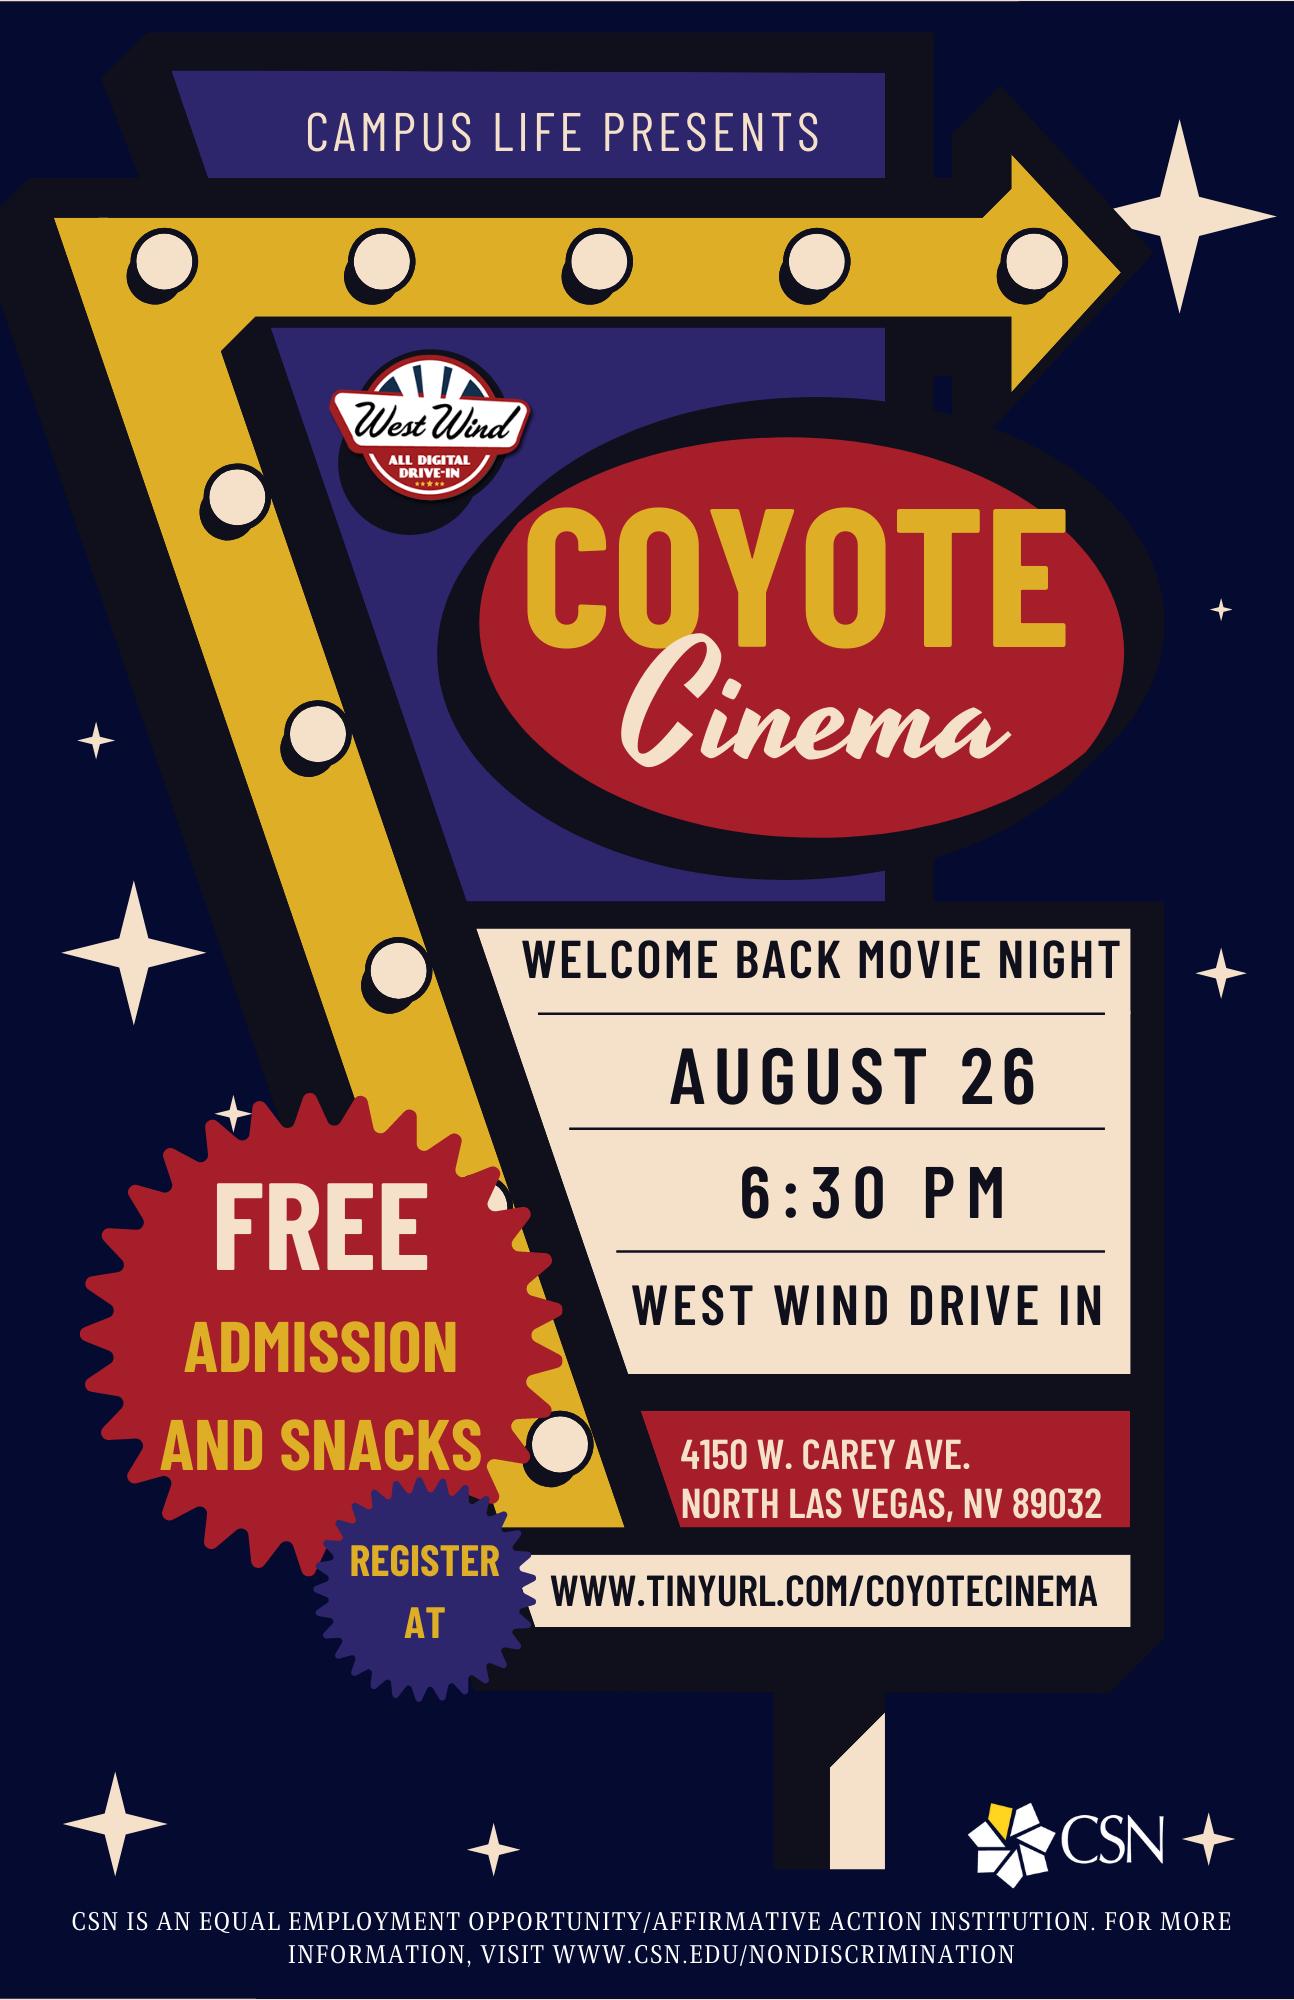 Coyote Cinema Marketing